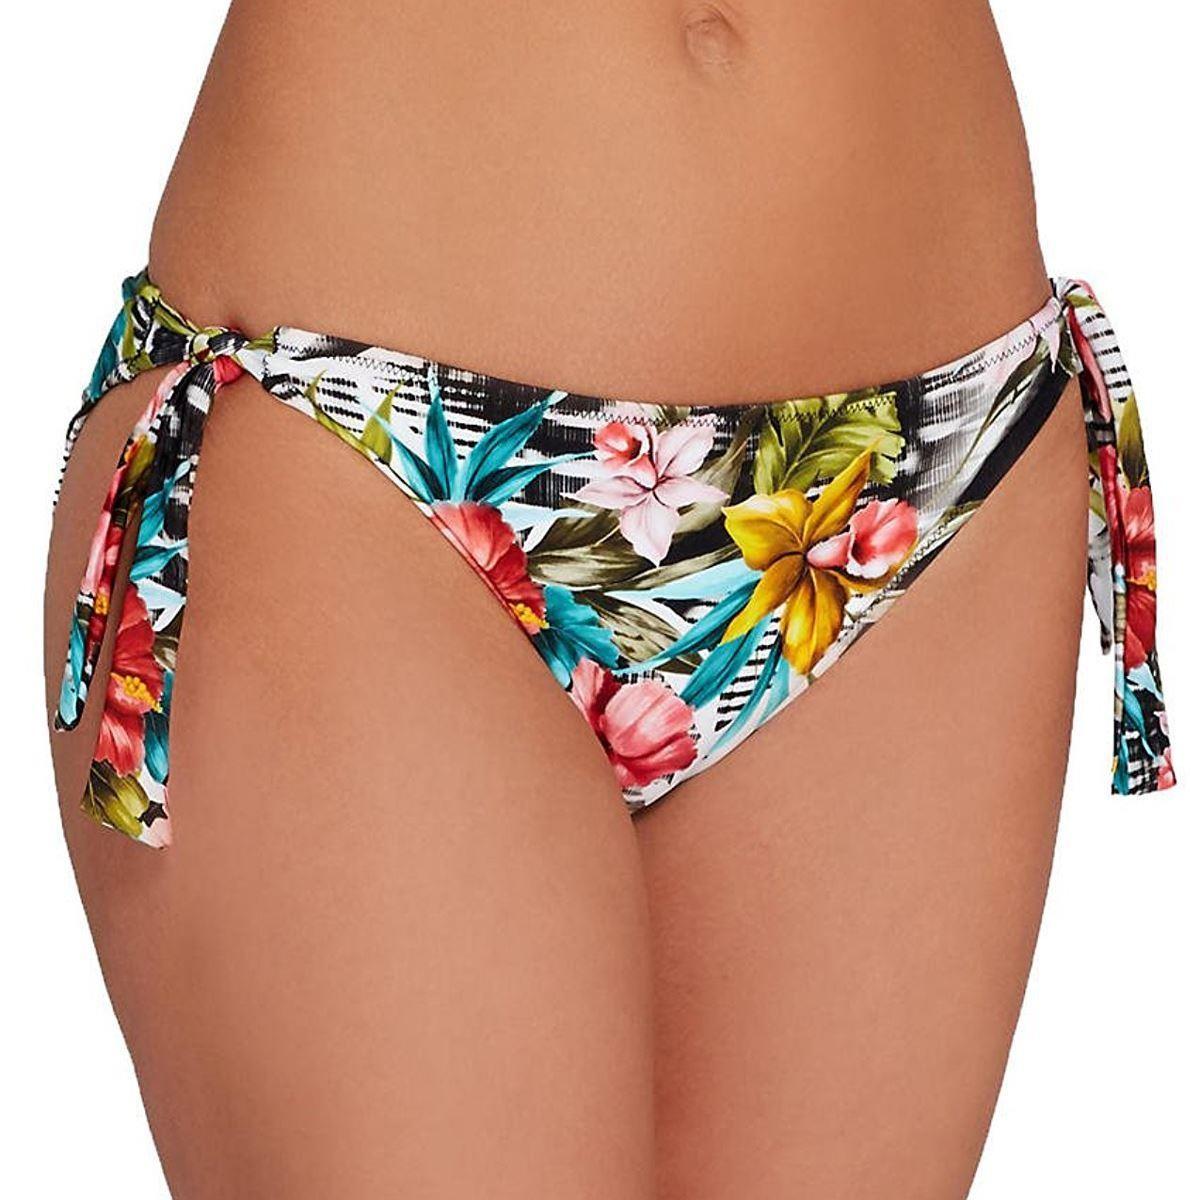 Fantasie Wakaya Classic Scarf Tie Bikini Brief - Multi